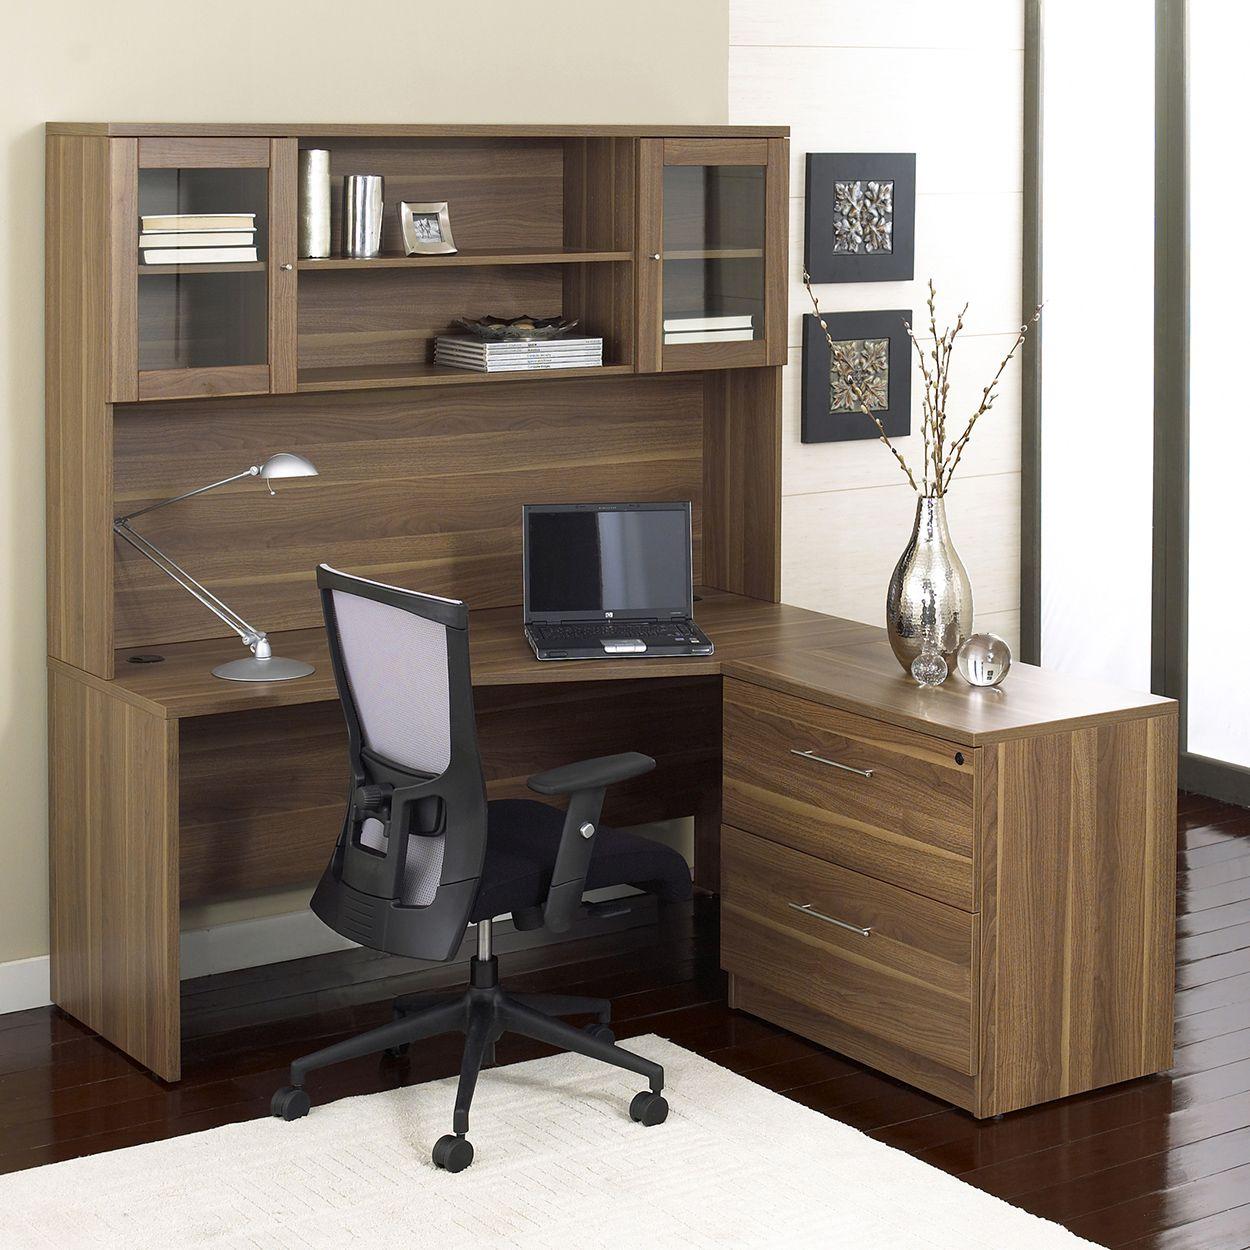 series corner desk. 100 Series 3 PC Desk And Hutch Office Set Is A Perfect Arrangement For Home / Corner